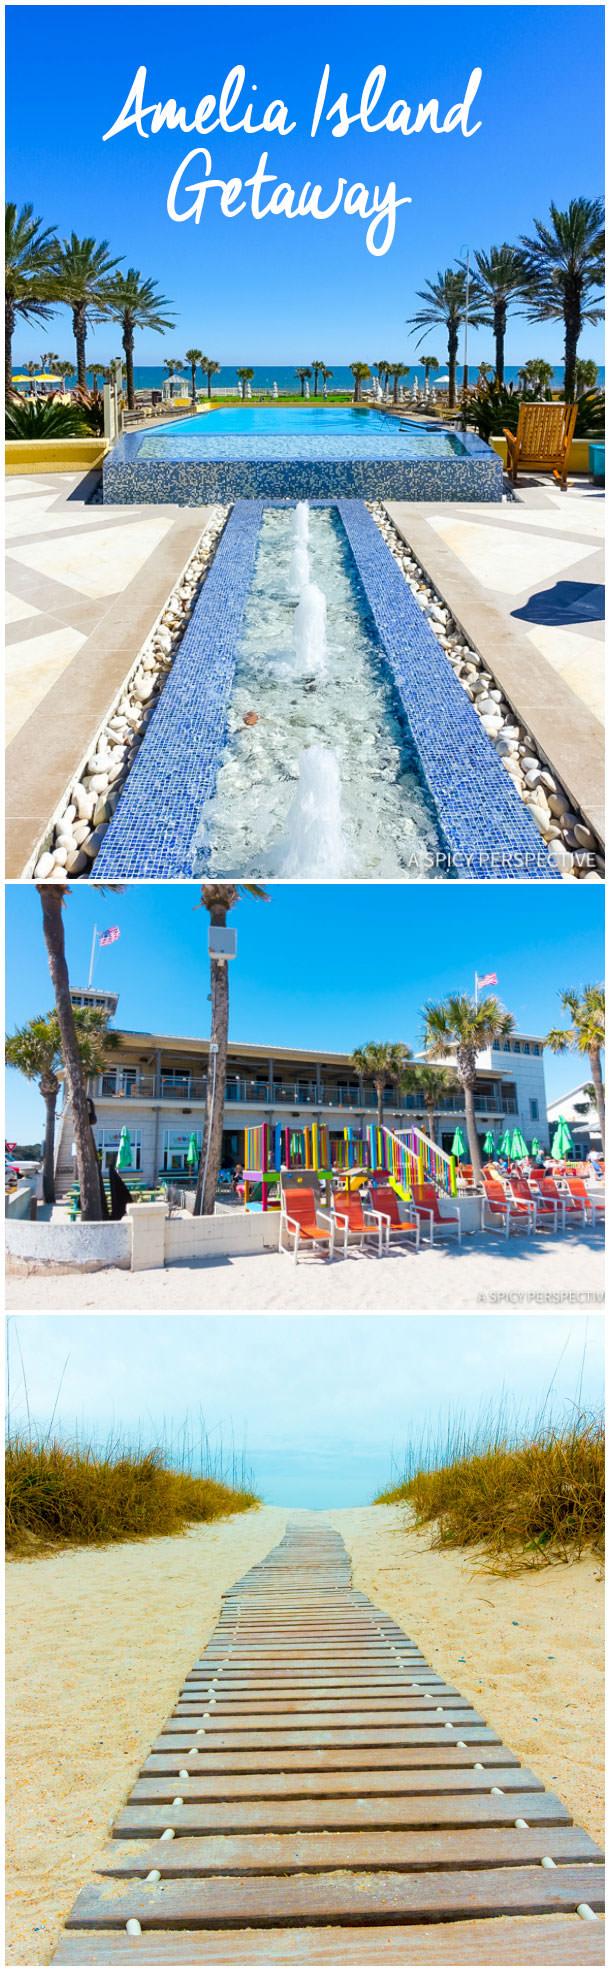 Where to Eat in Amelia Island, Florida - Travel Planning Tips for Amelia Island & Ferandina Beach!   ASpicyPerspective.com